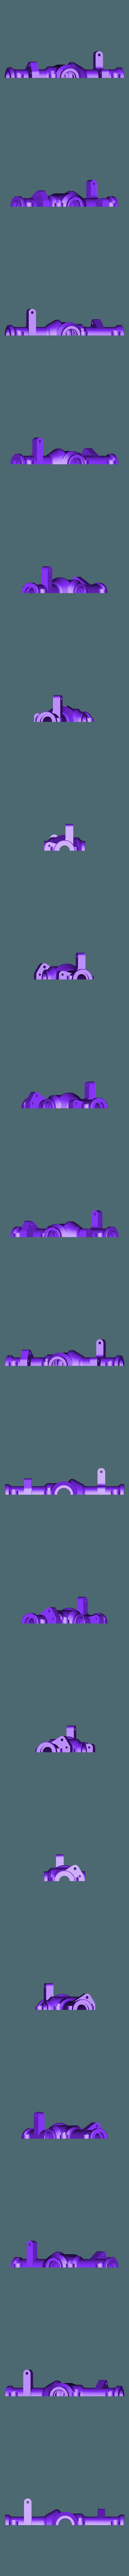 Truck_V4_Axle_Rear_Tandem_Top.STL Download STL file 3D Printed Rc Truck V4 • 3D printable template, MrCrankyface